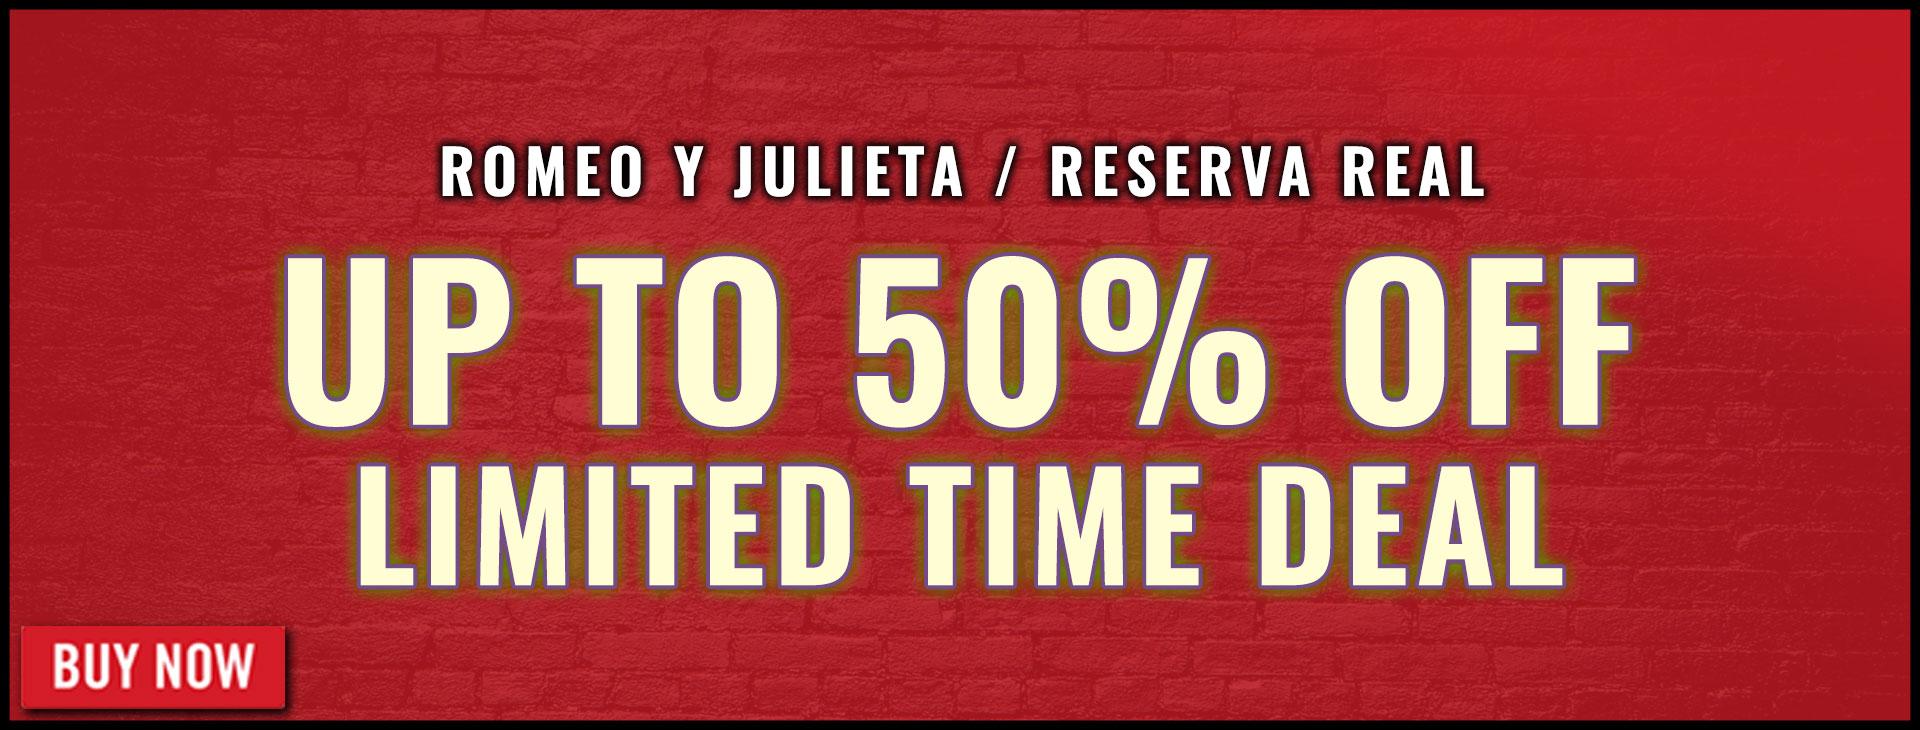 romeo-y-julieta-reserva-real-2021-banner.jpg